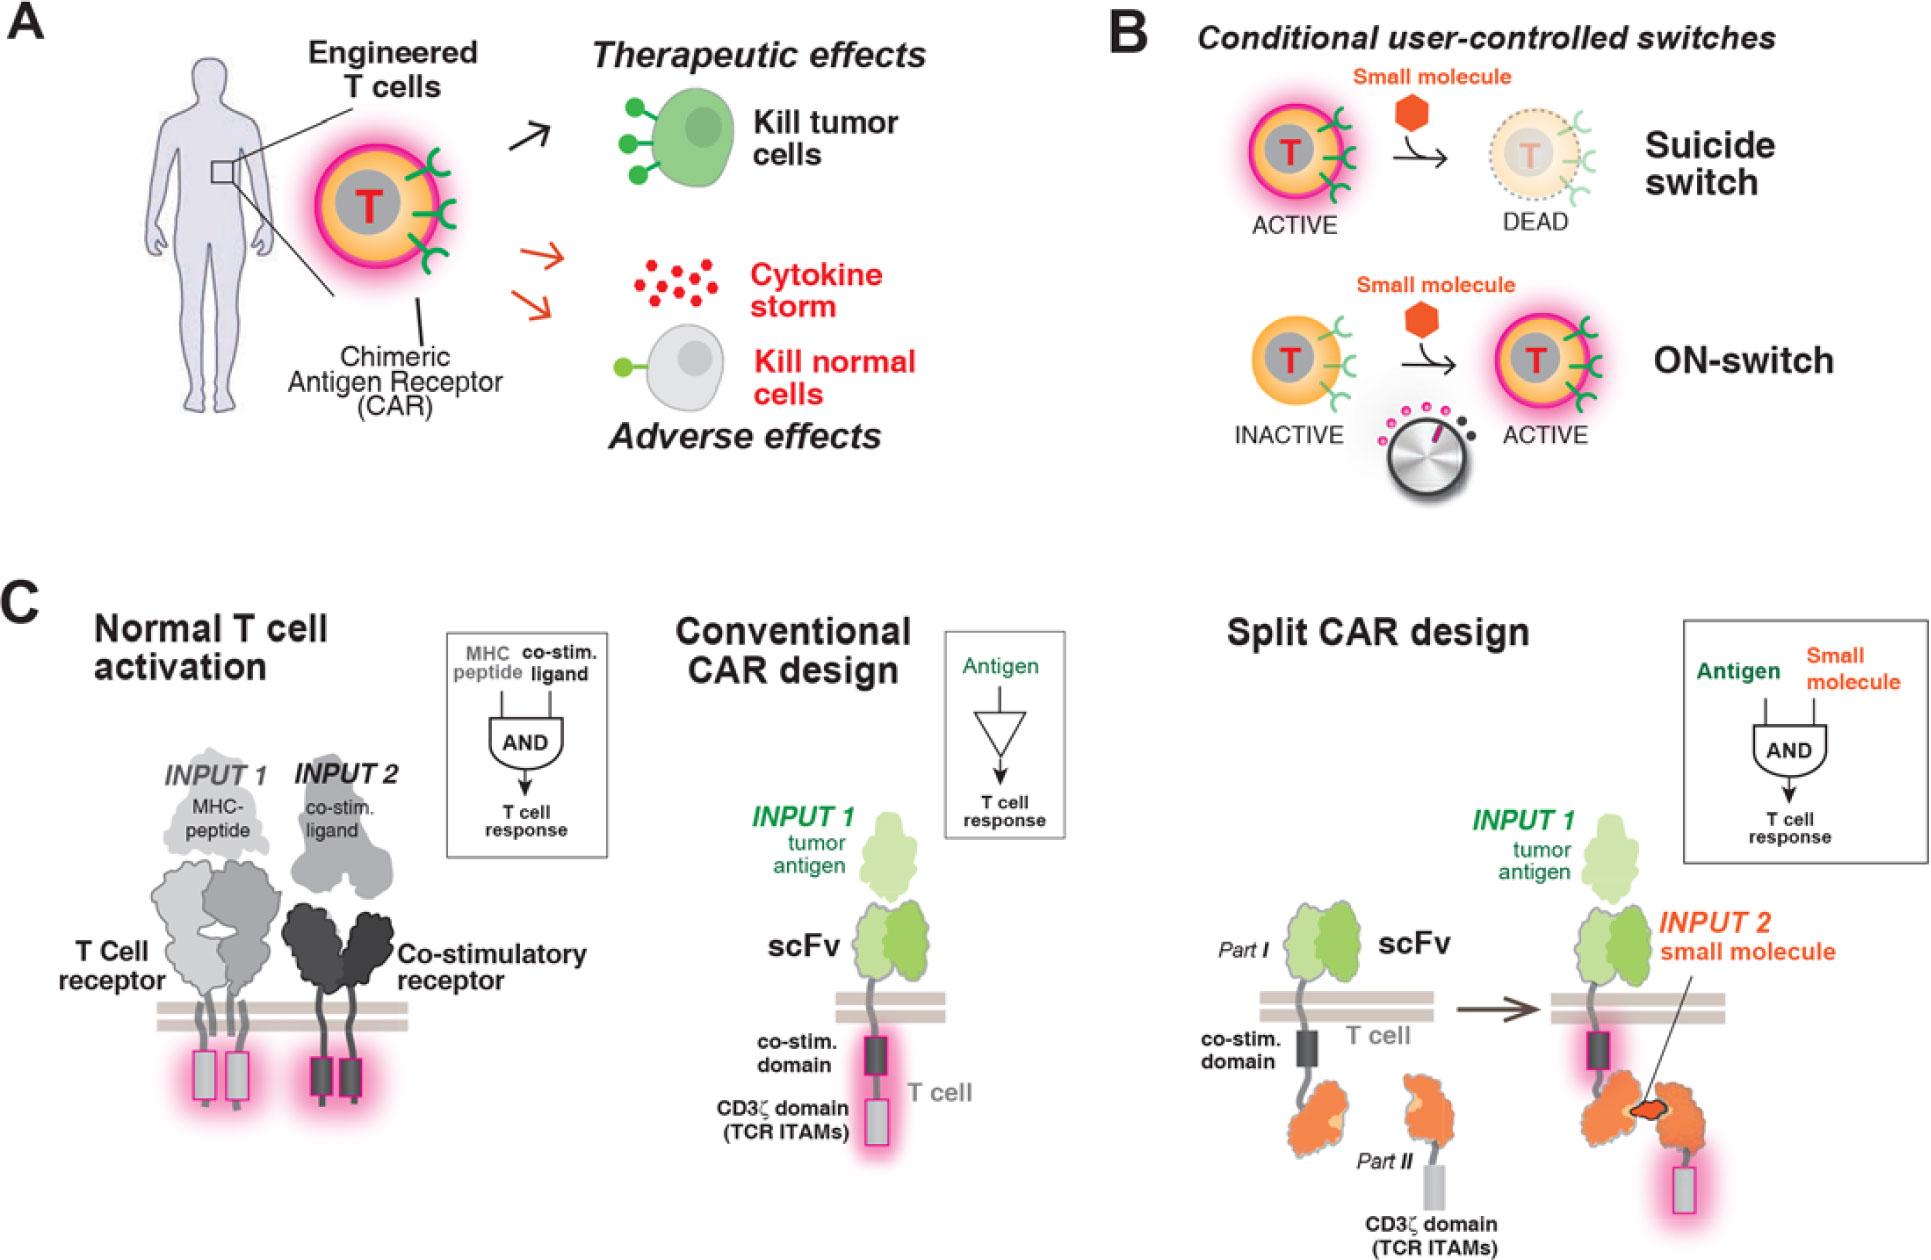 throttle switch - Cell Design Labs и технологии программирования T-клеток